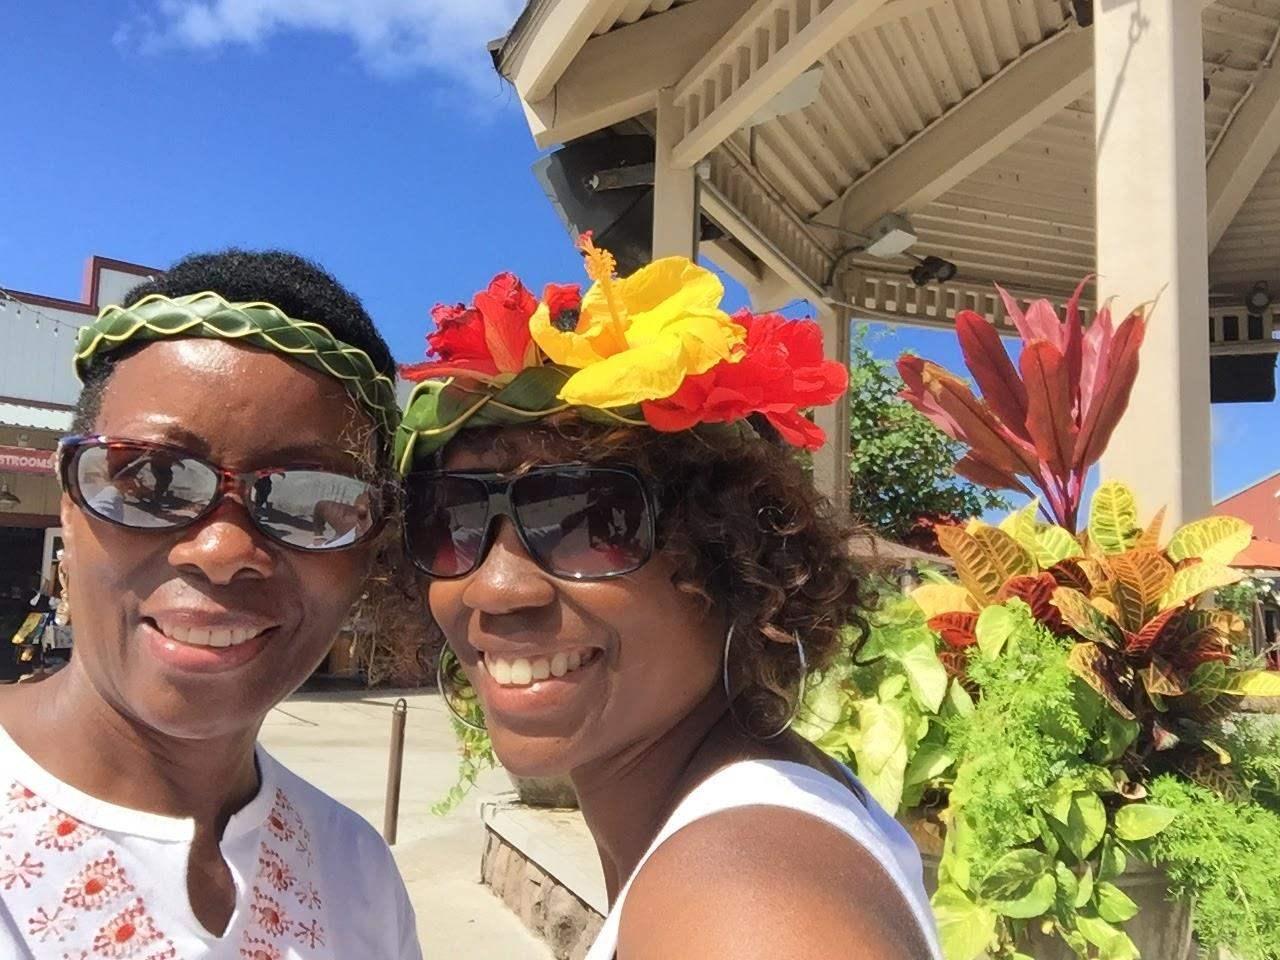 Shirley Seymour with her daughter, Ayisha Uri Seymour, in Hawaii